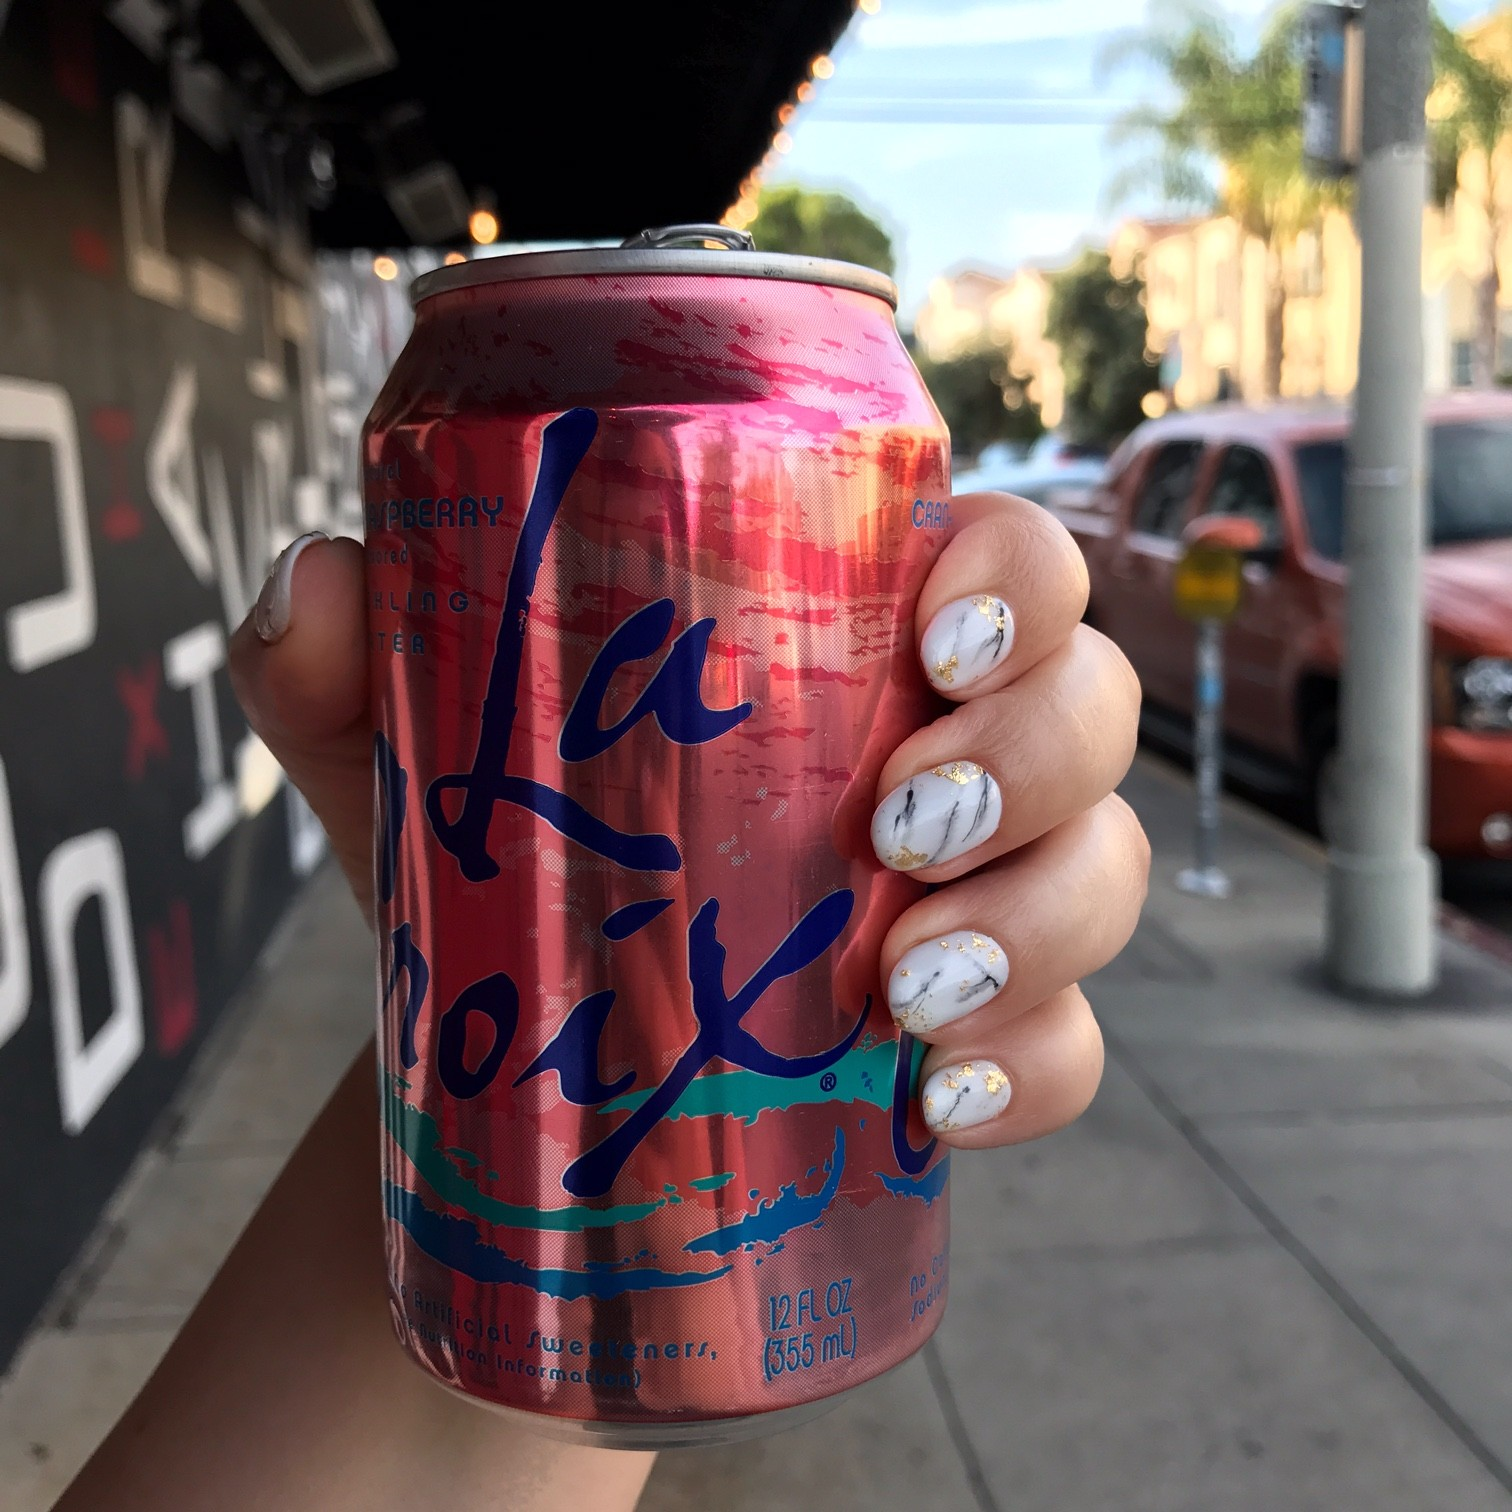 Cruelty Free Nail Salon Los Angeles - Color Camp Nail Art